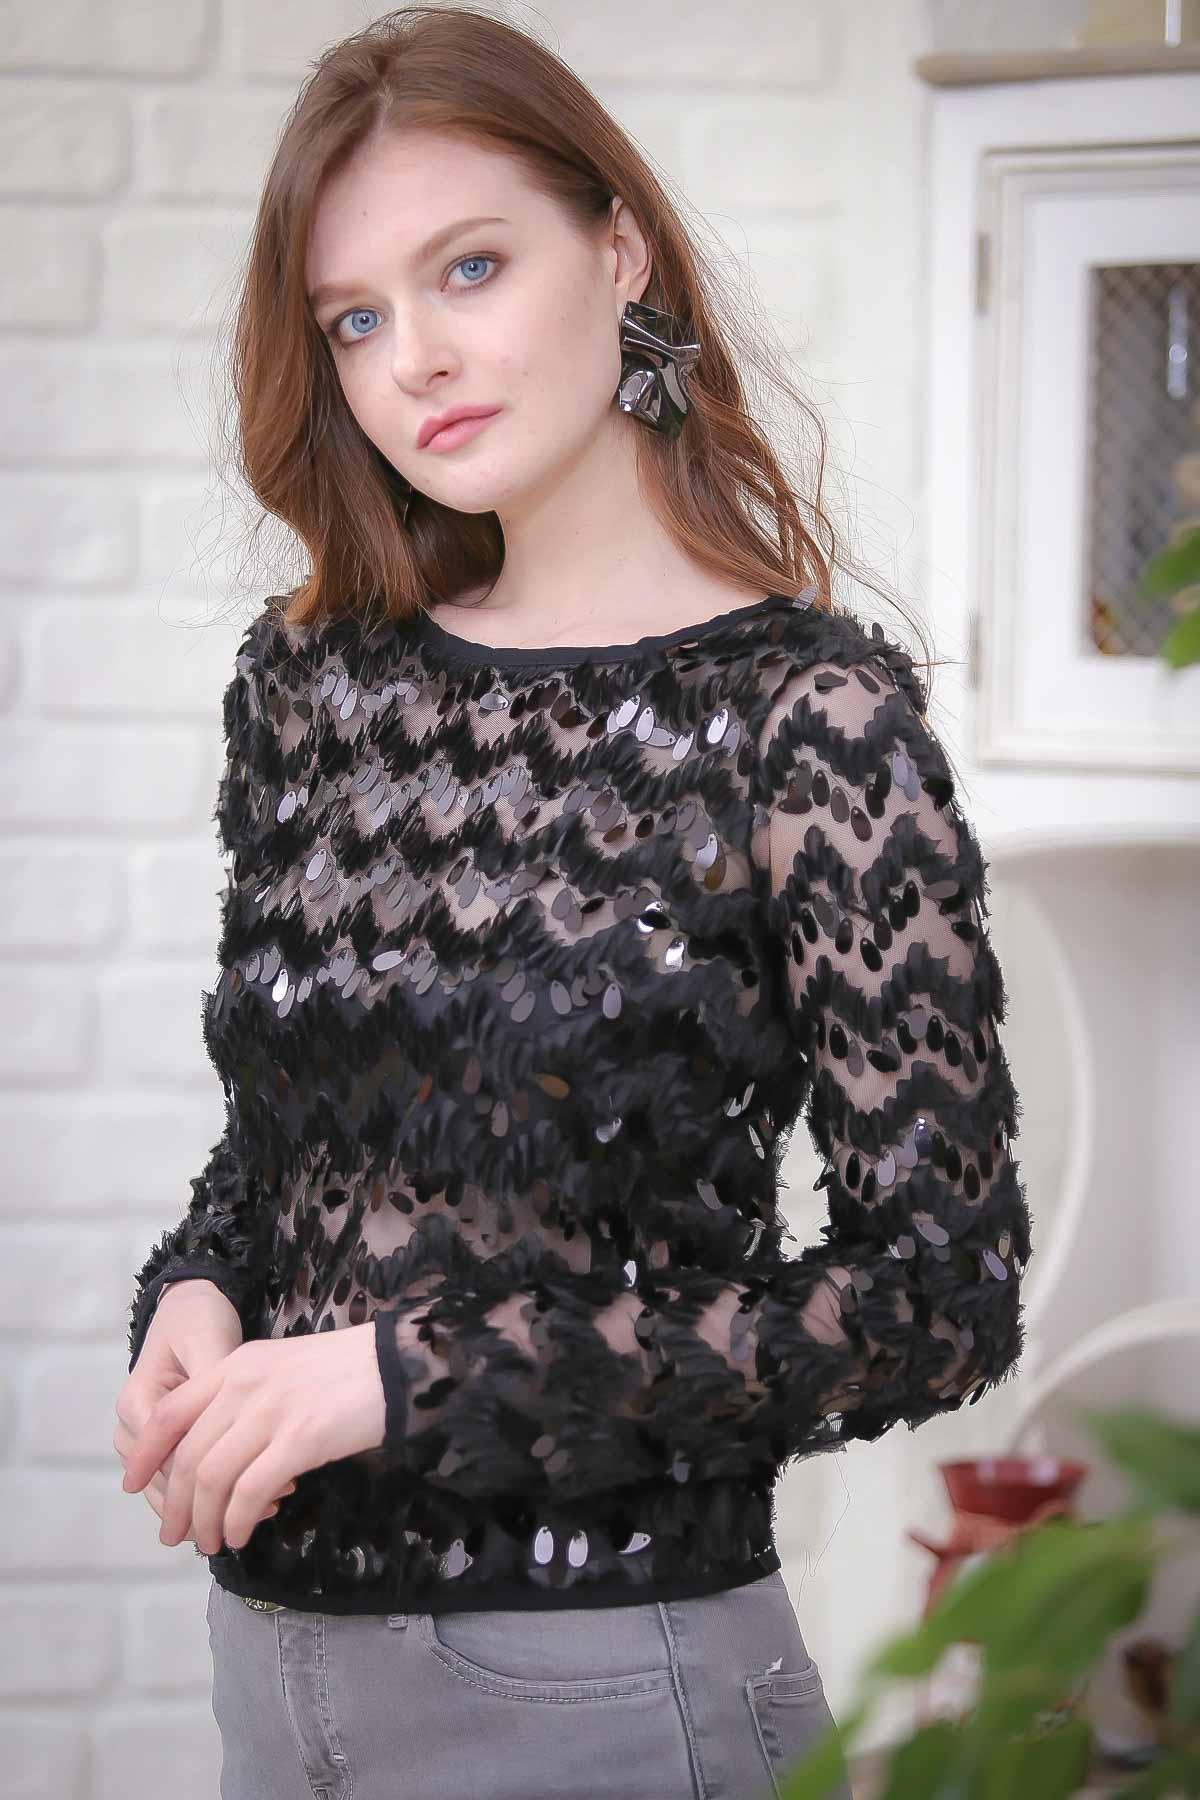 Drop flakes detailed lace blouse